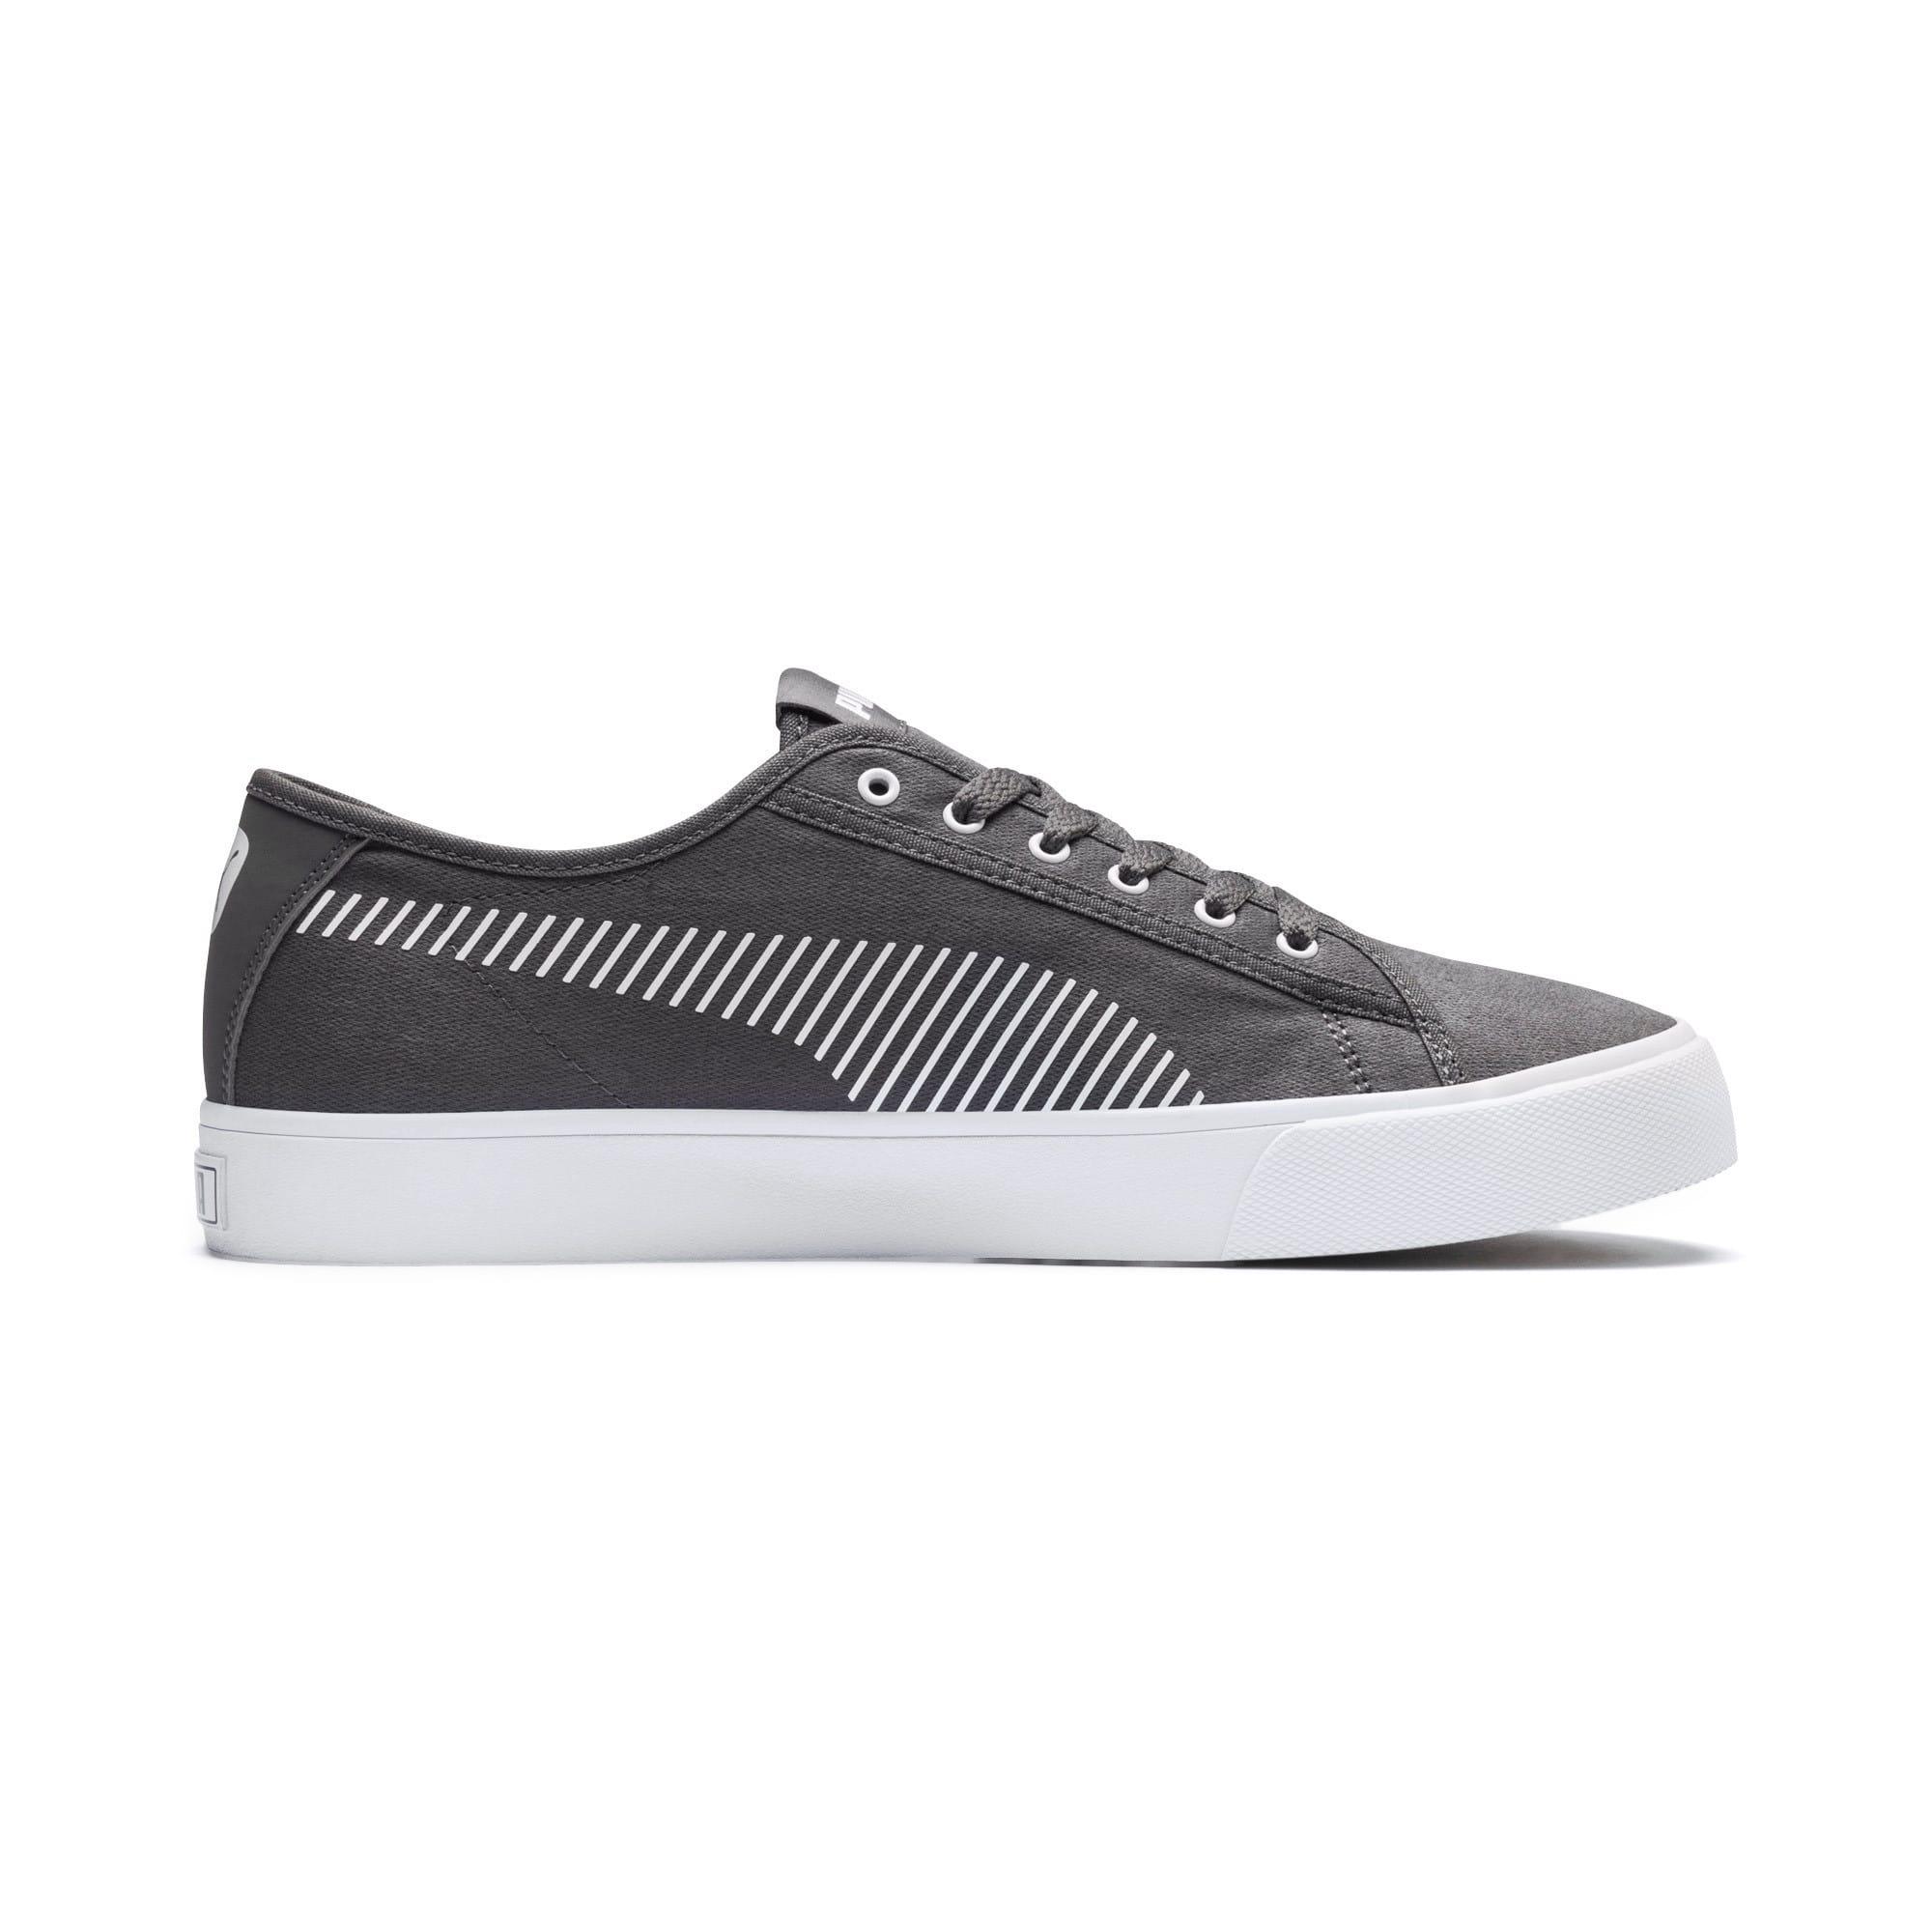 Thumbnail 5 of Bari Sneakers, Charcoal Gray-Puma White, medium